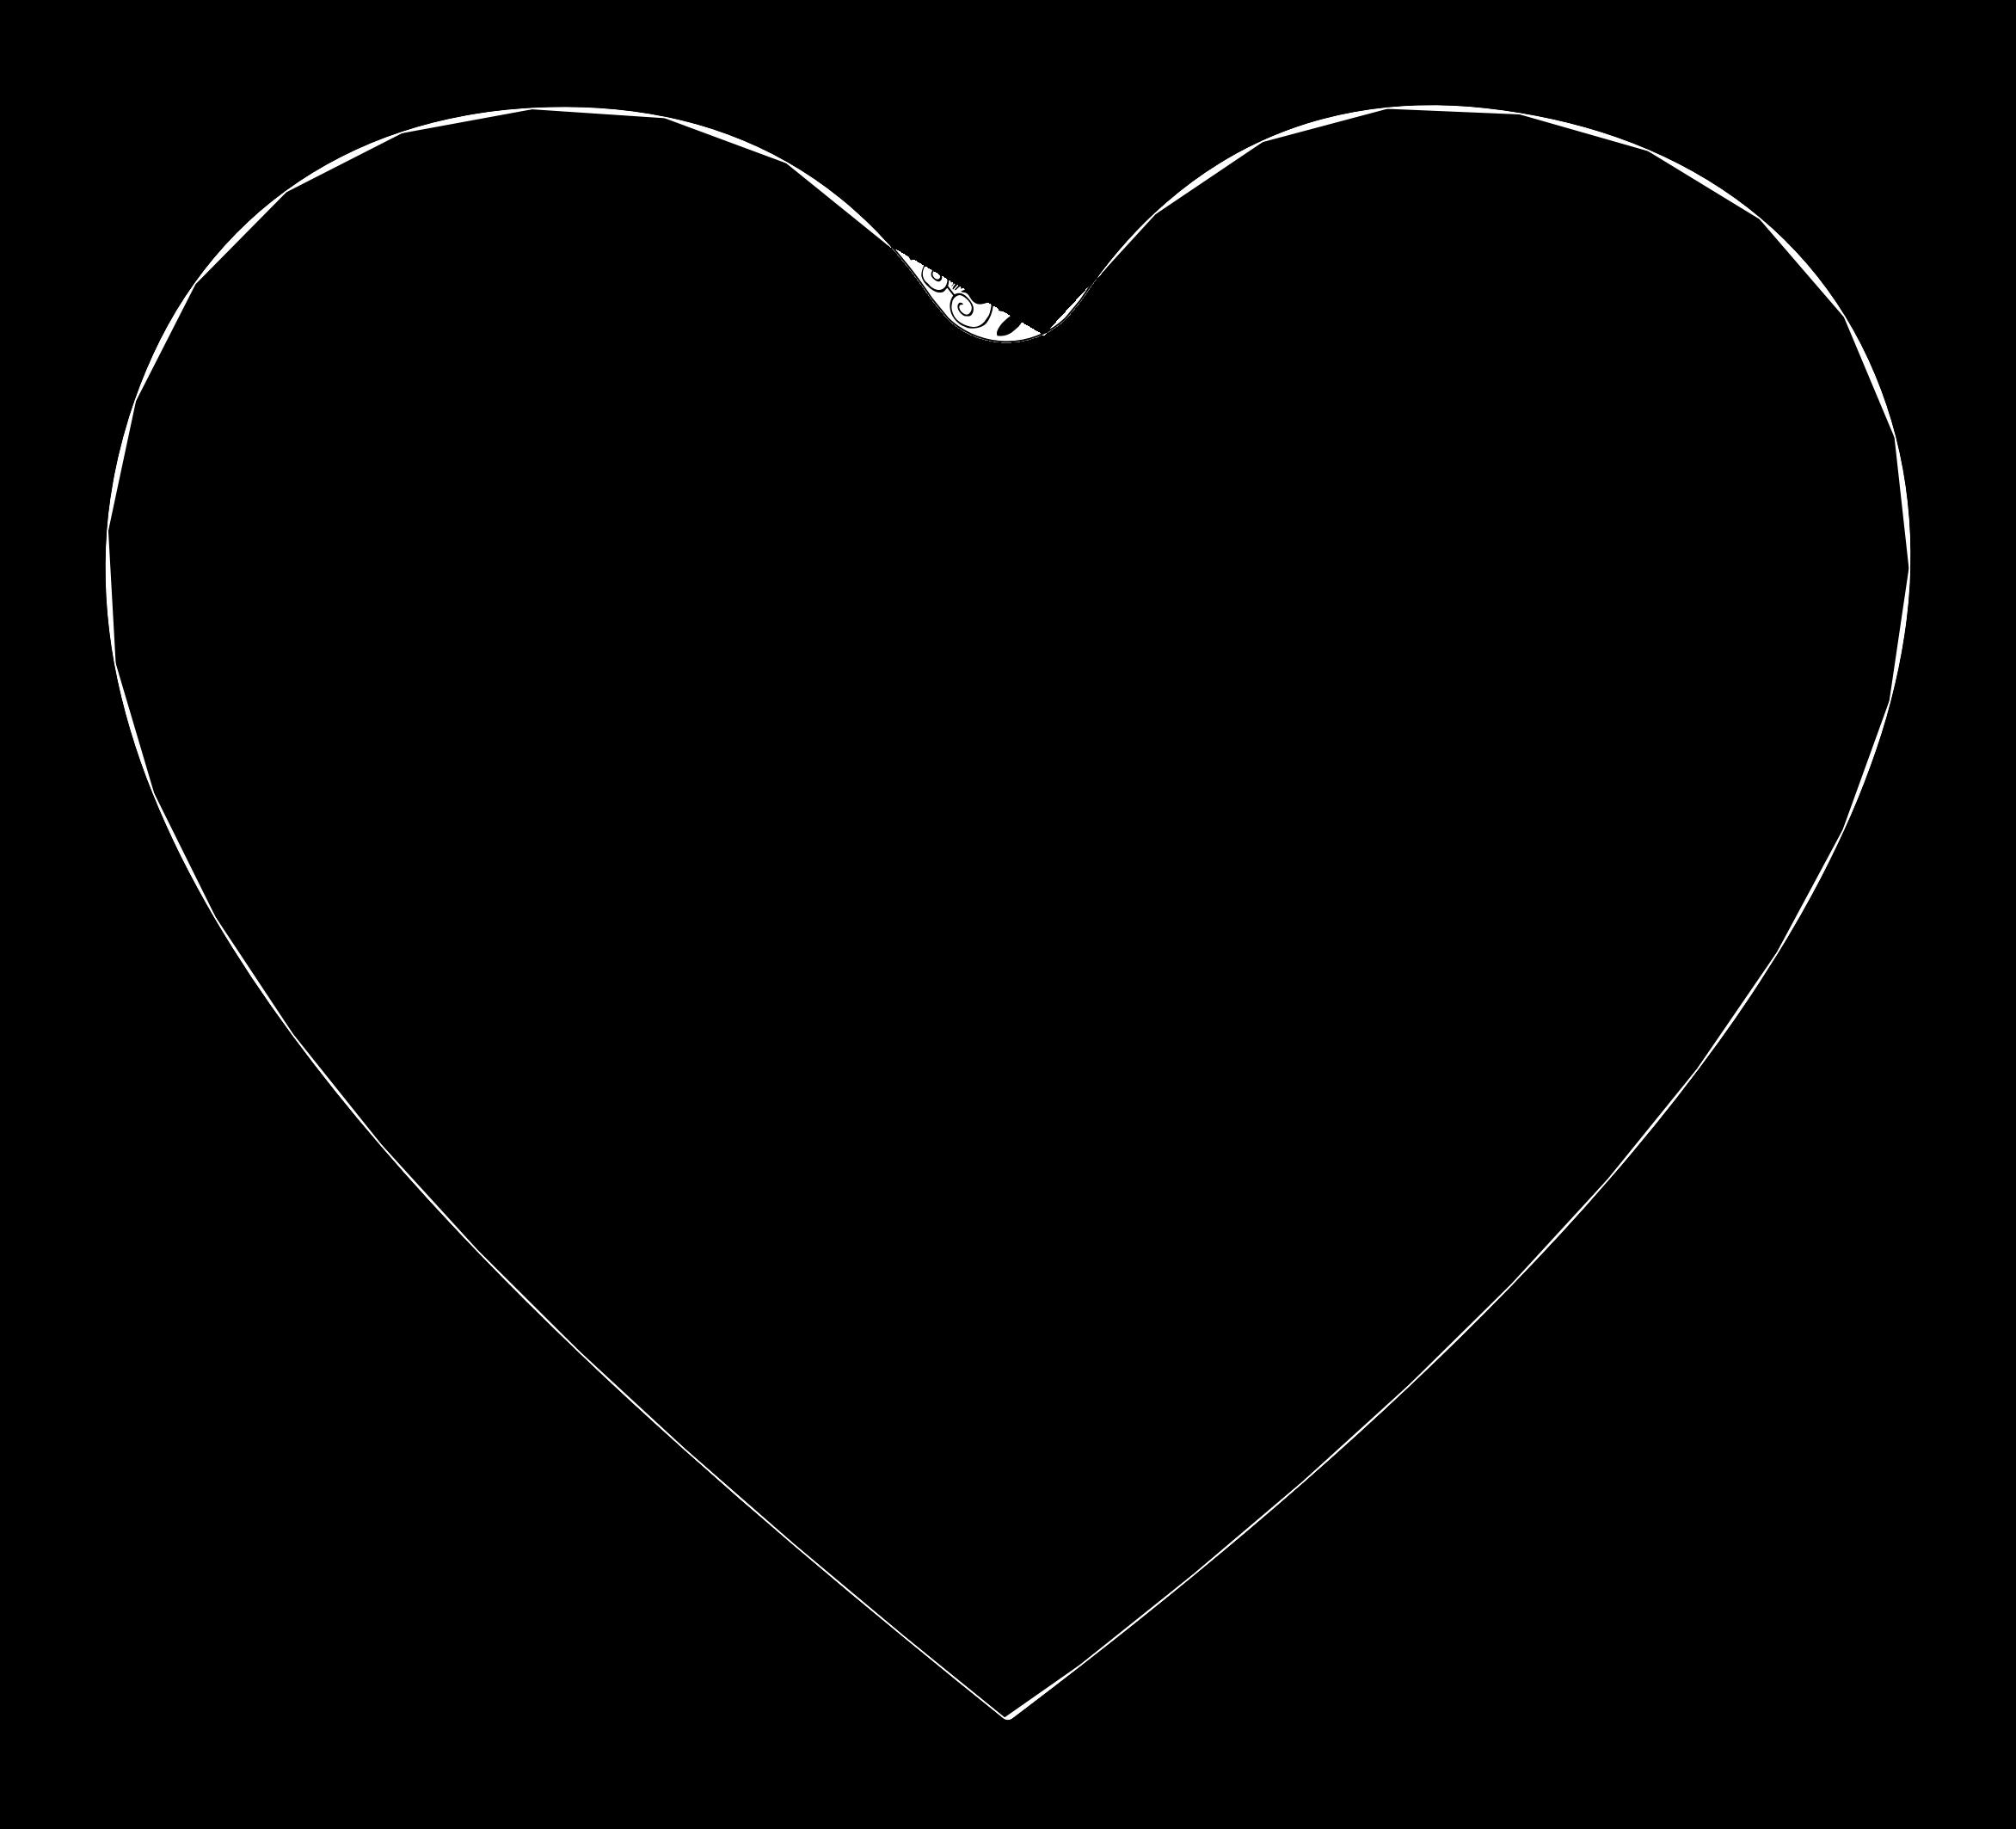 Flourish clipart ornamental. Decorative heart icons png